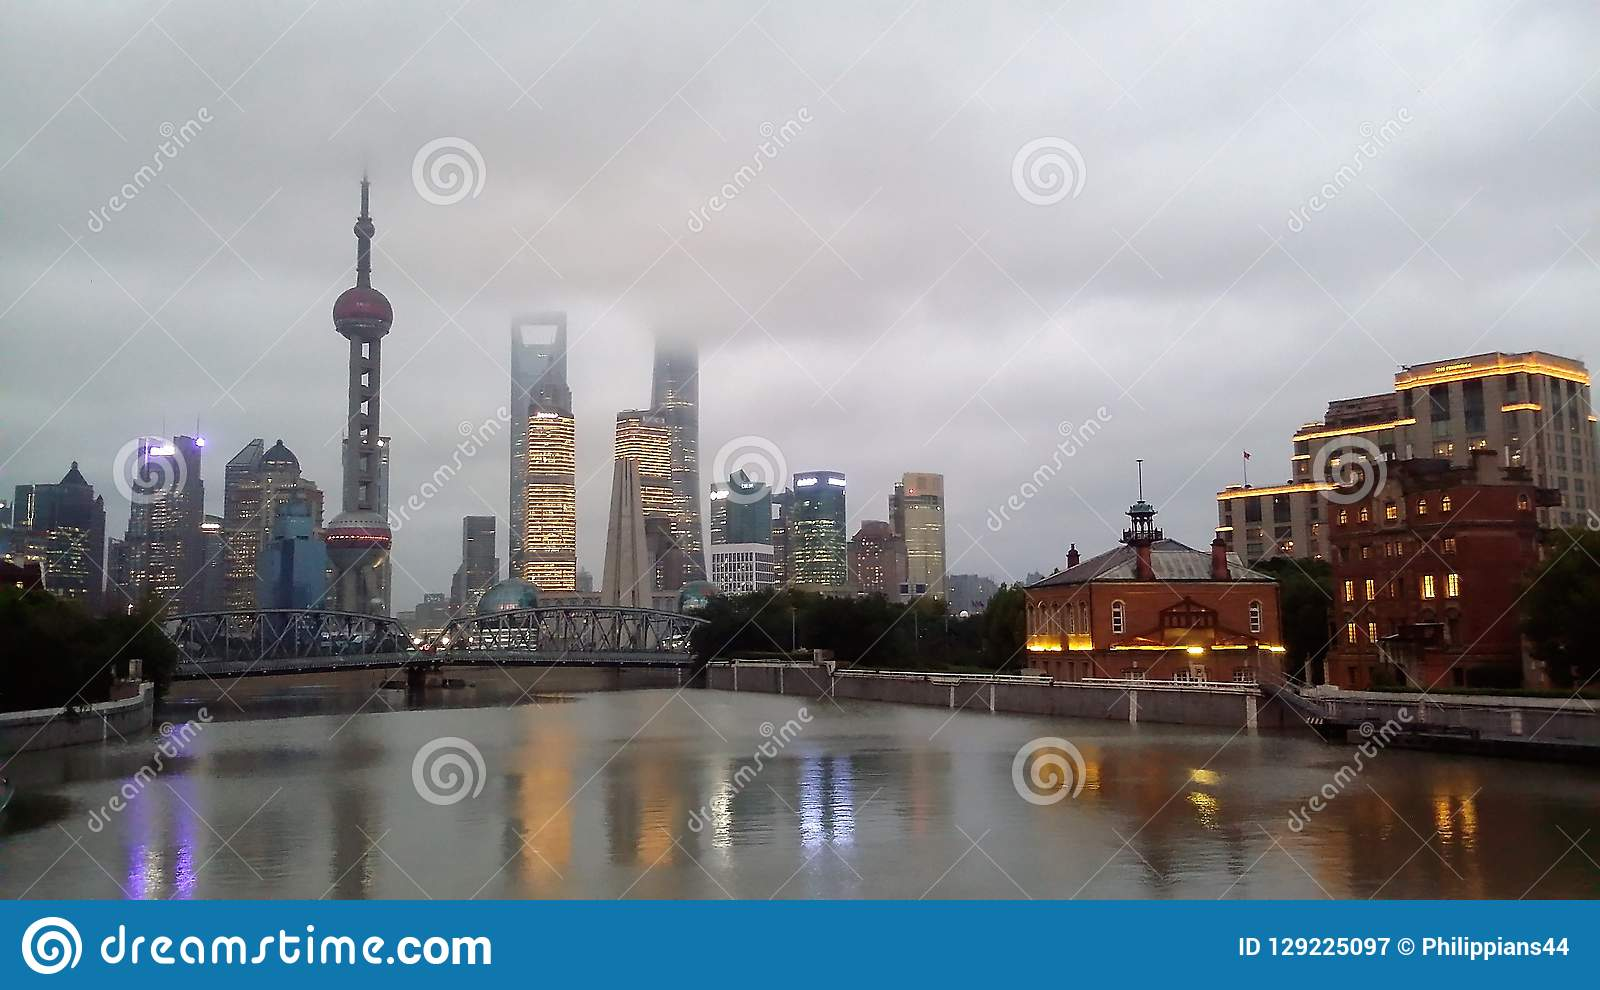 Horizonte de la ciudad de Shangai, China en el río Huangpu